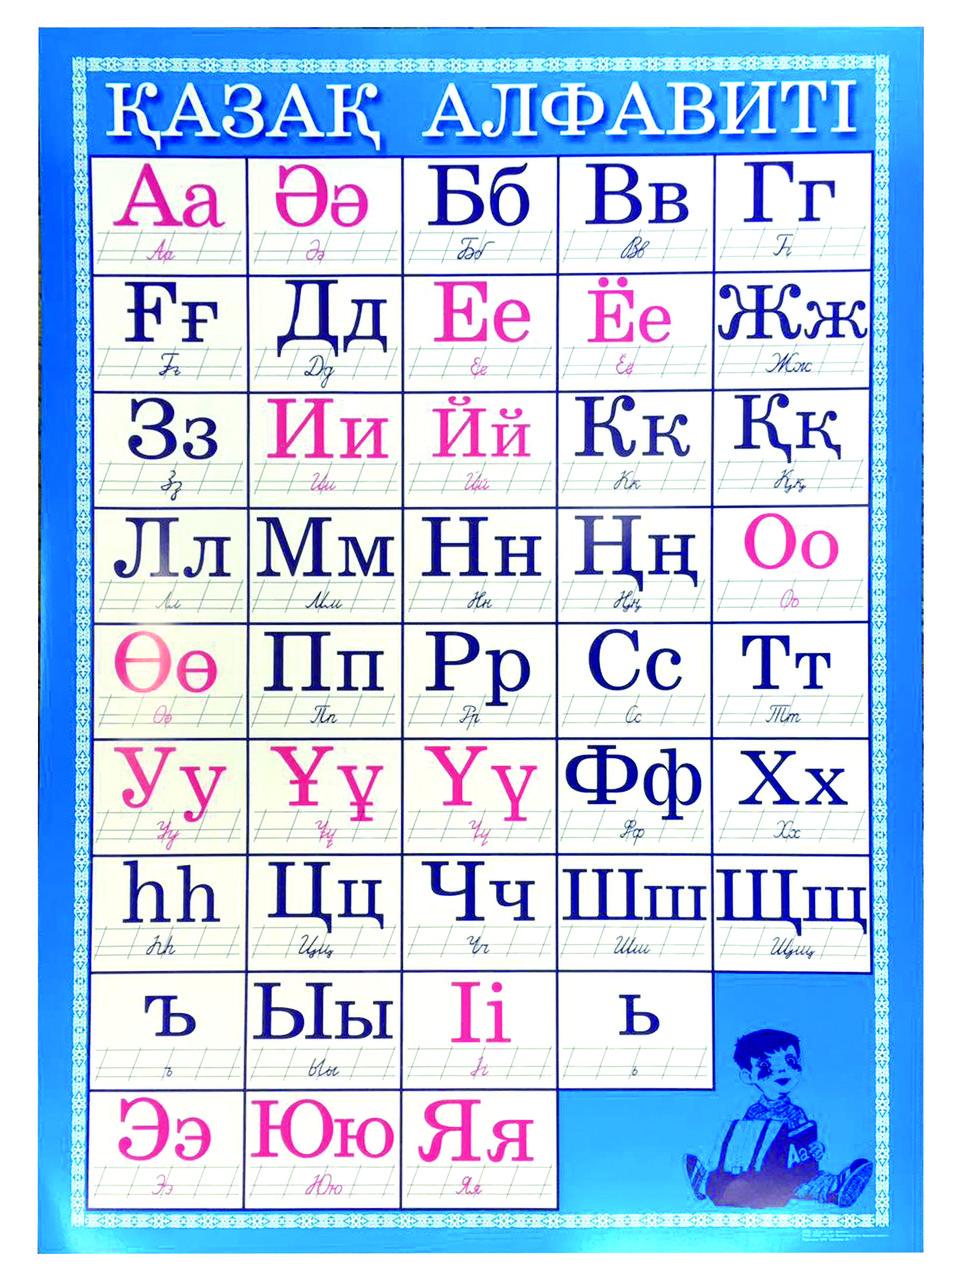 Казахский алфавит